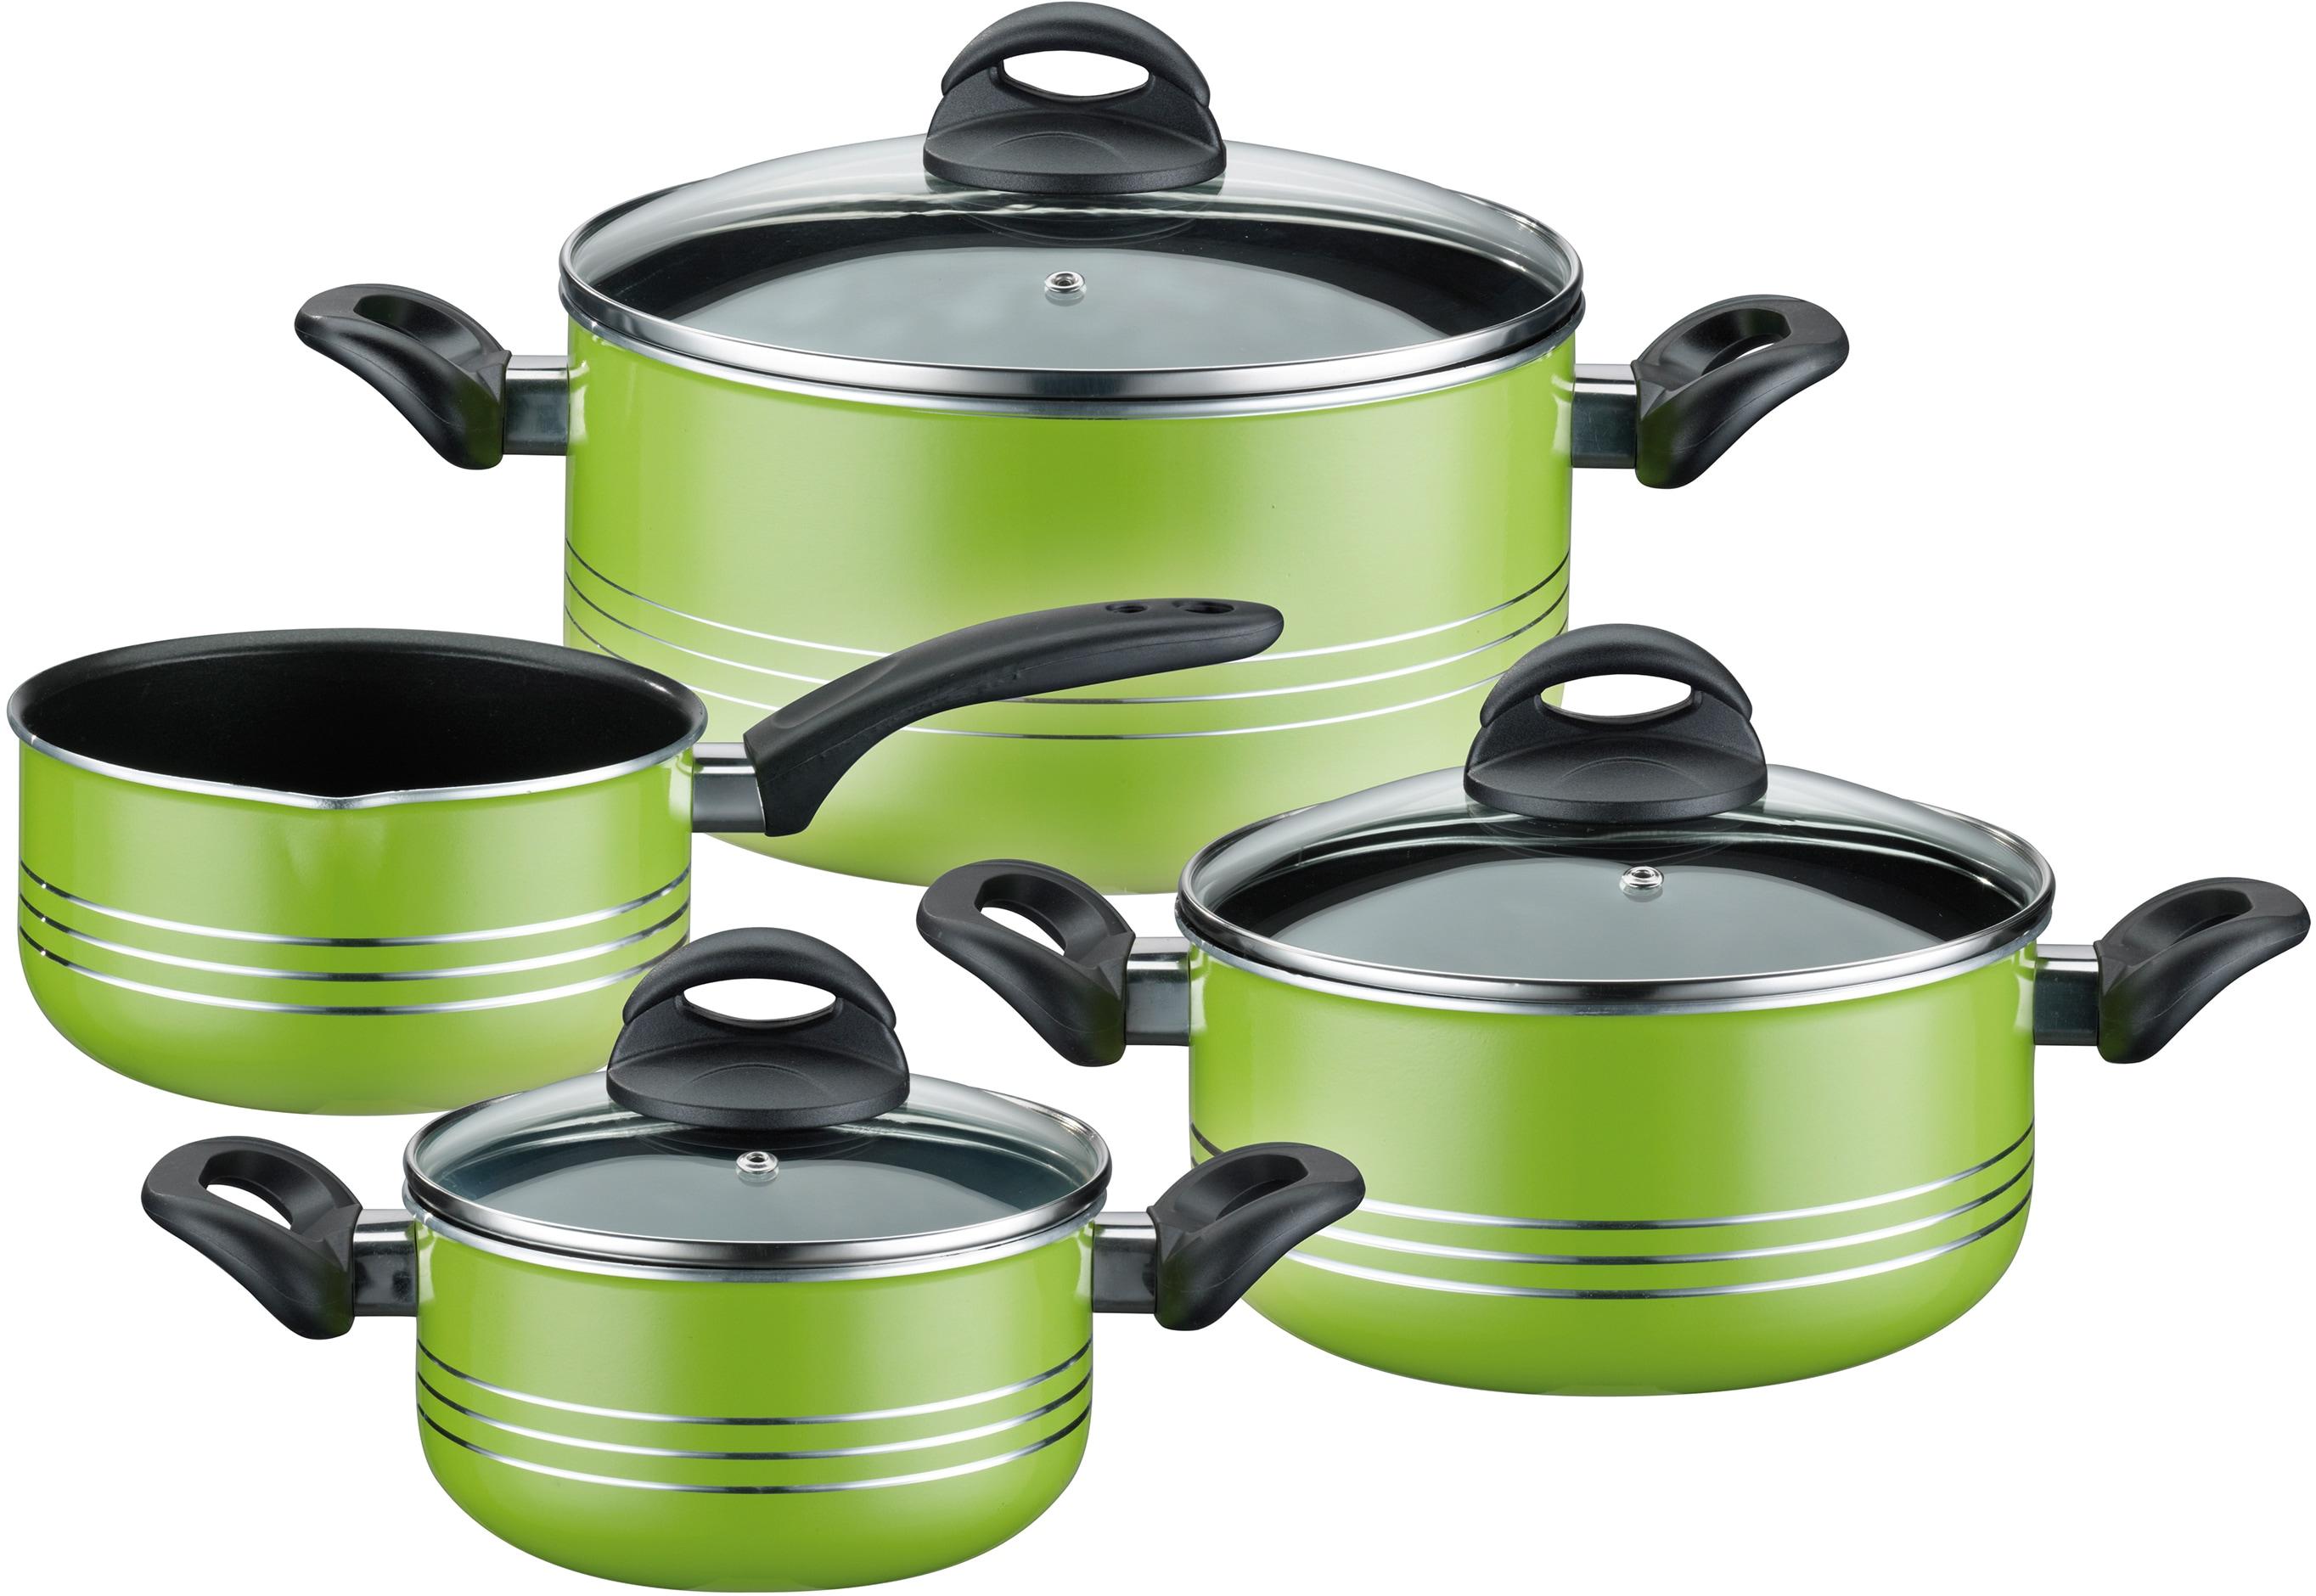 GSW Topf-Set Milano color, Leichtmetall-Legierung, (Set, 7 tlg.), Induktion grün Topfsets Töpfe Haushaltswaren Topf